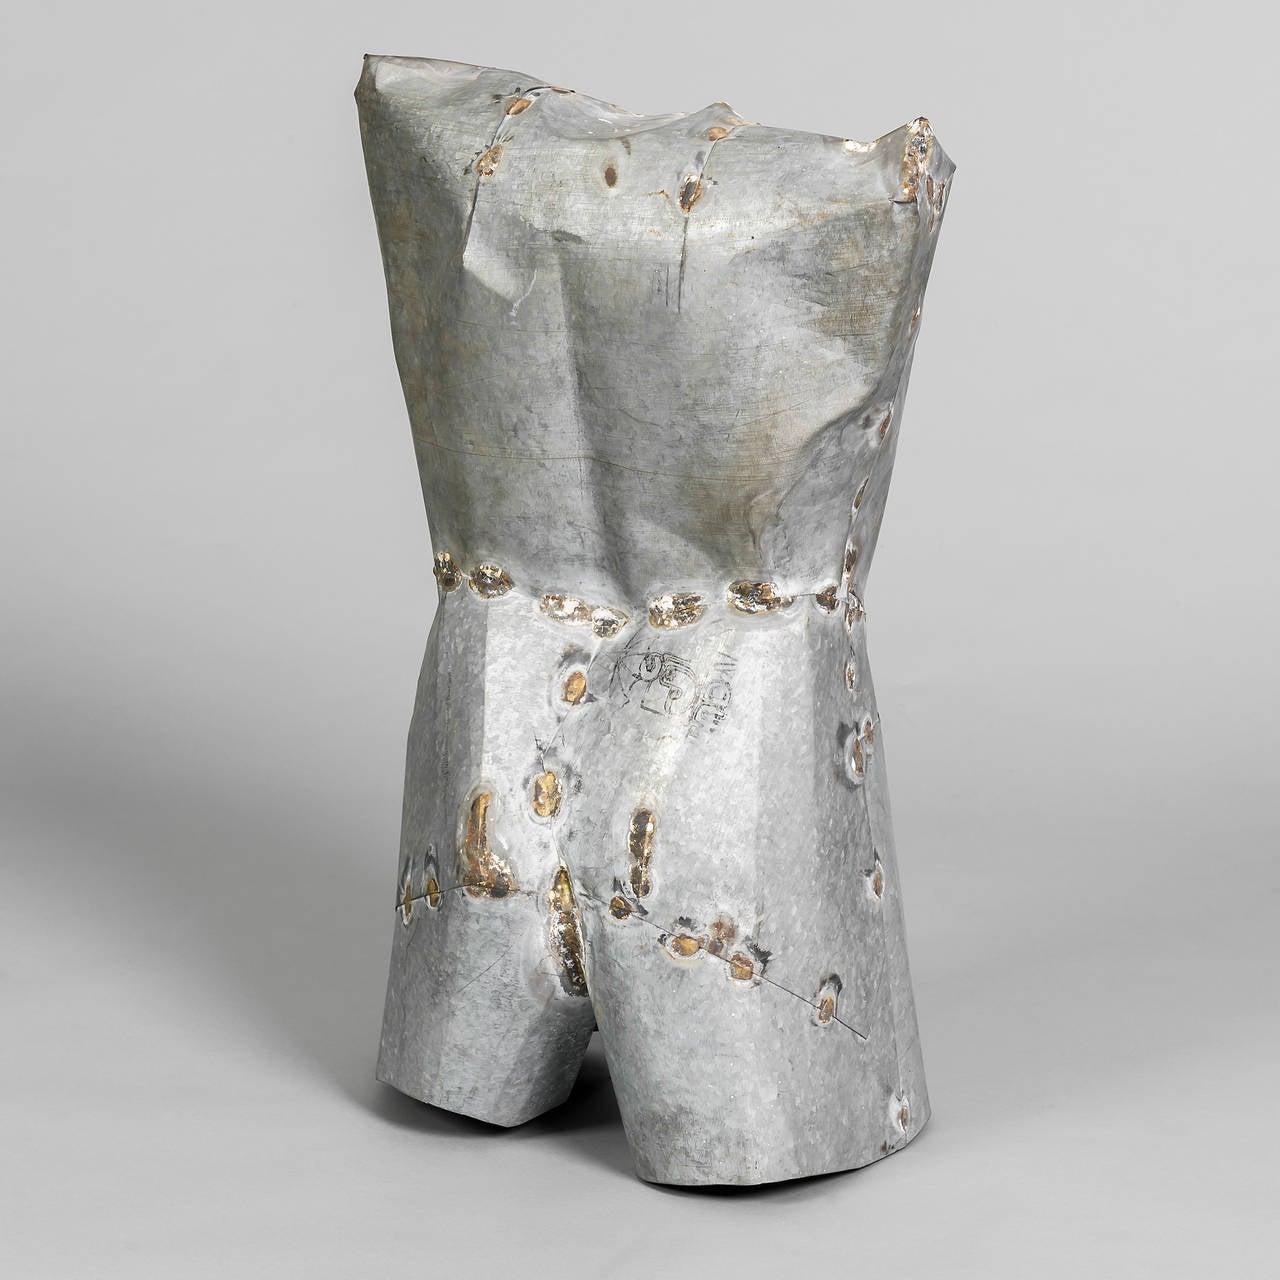 Pressed Pair of Torso Sculptures in Zinc For Sale